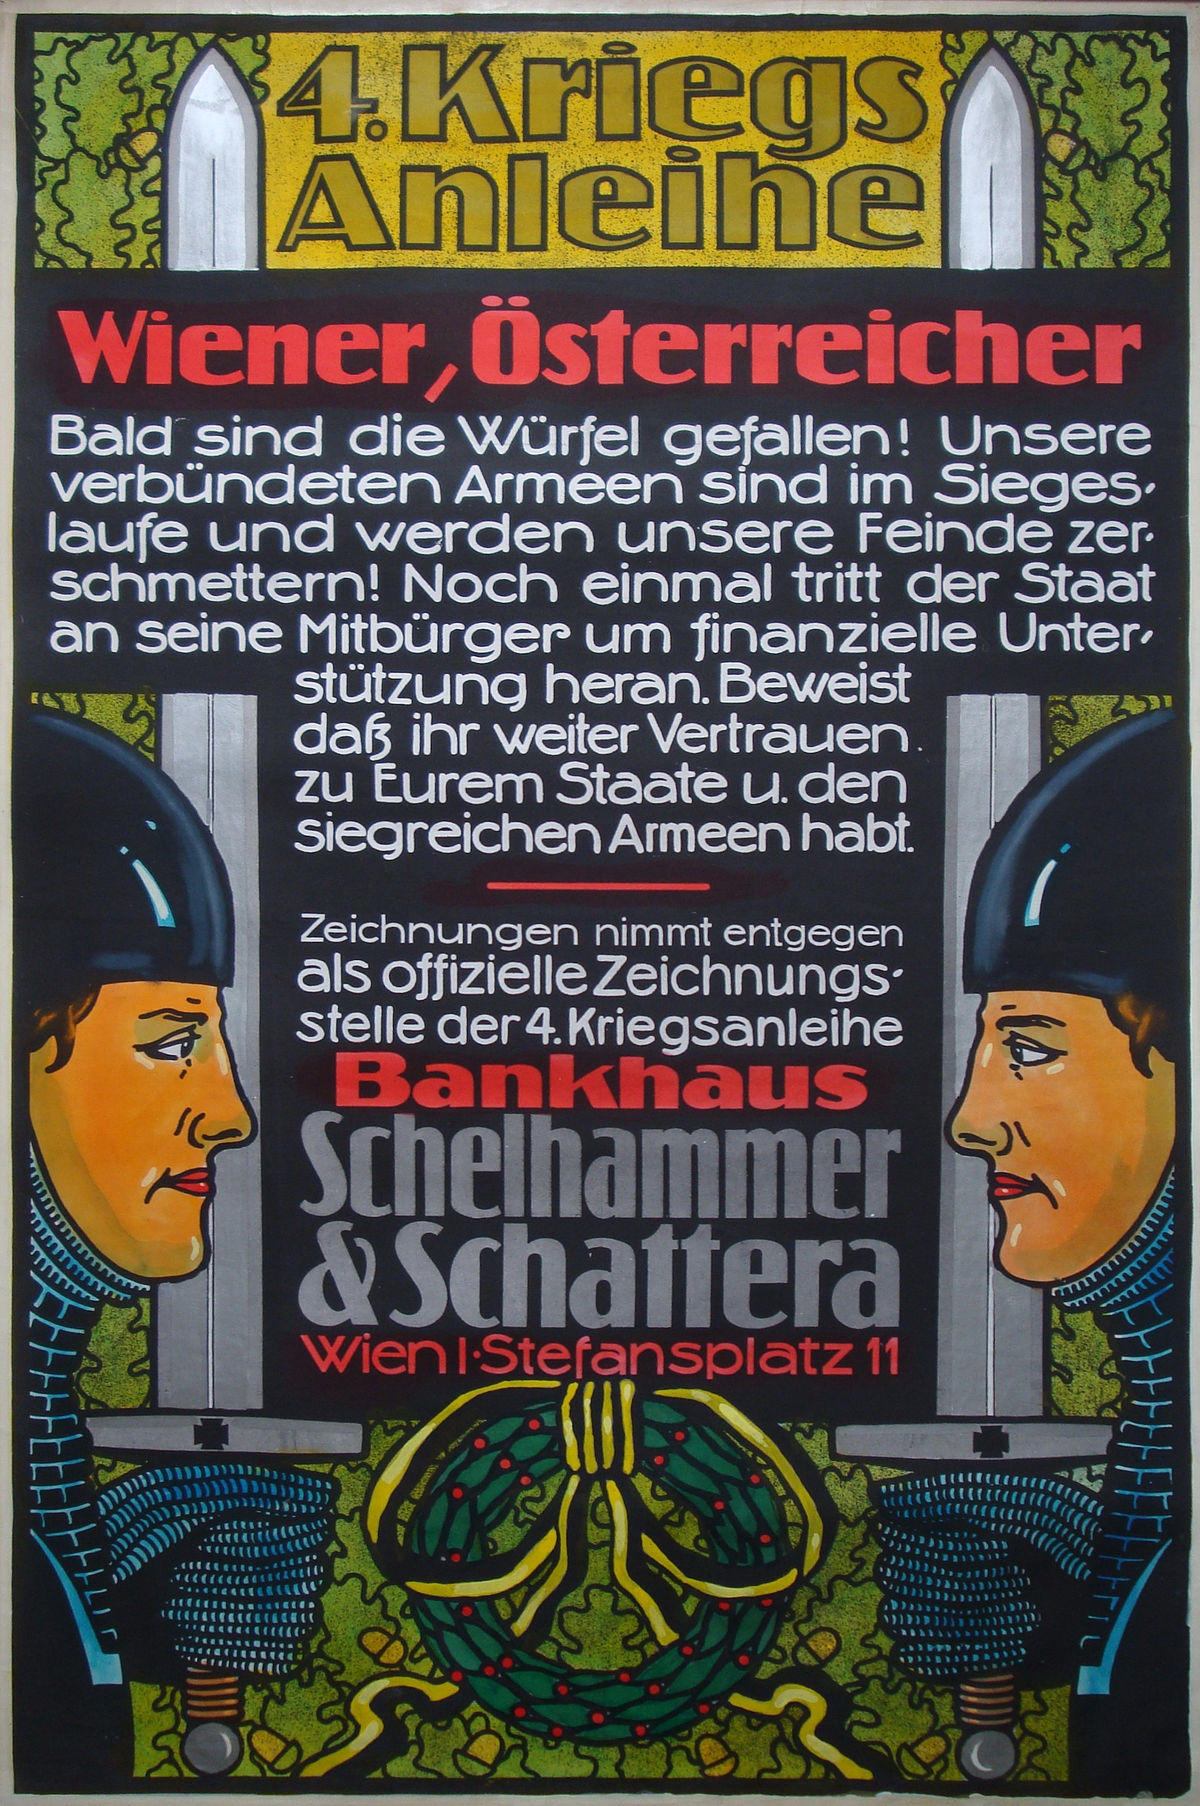 Schelhammer